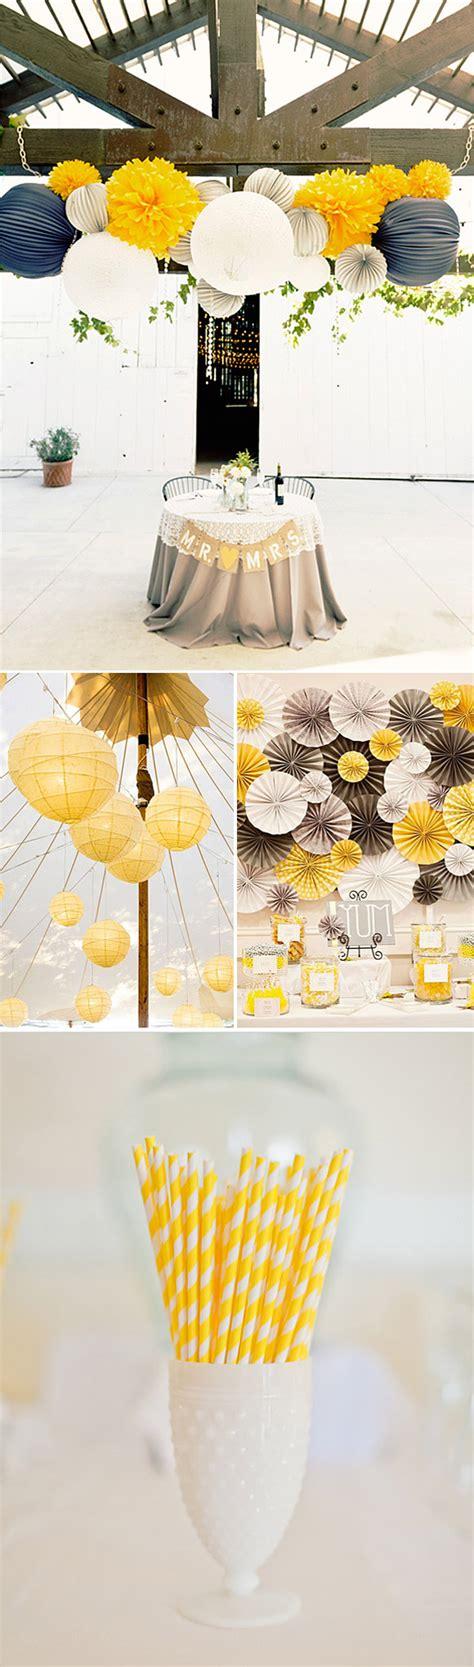 decoraci 243 n de fiestas como decorar mesas para boda